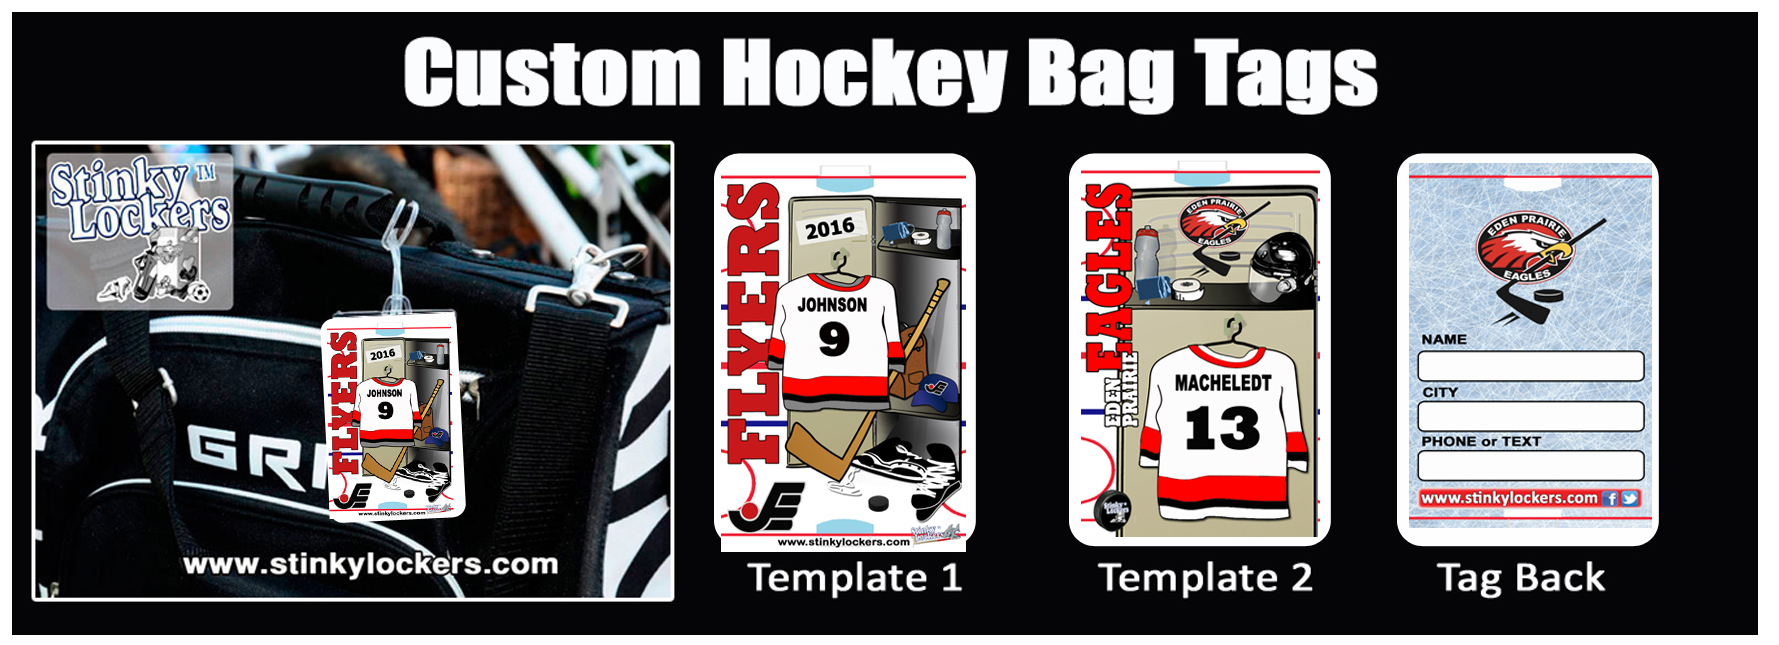 hockey-tag-optionsv2.jpg